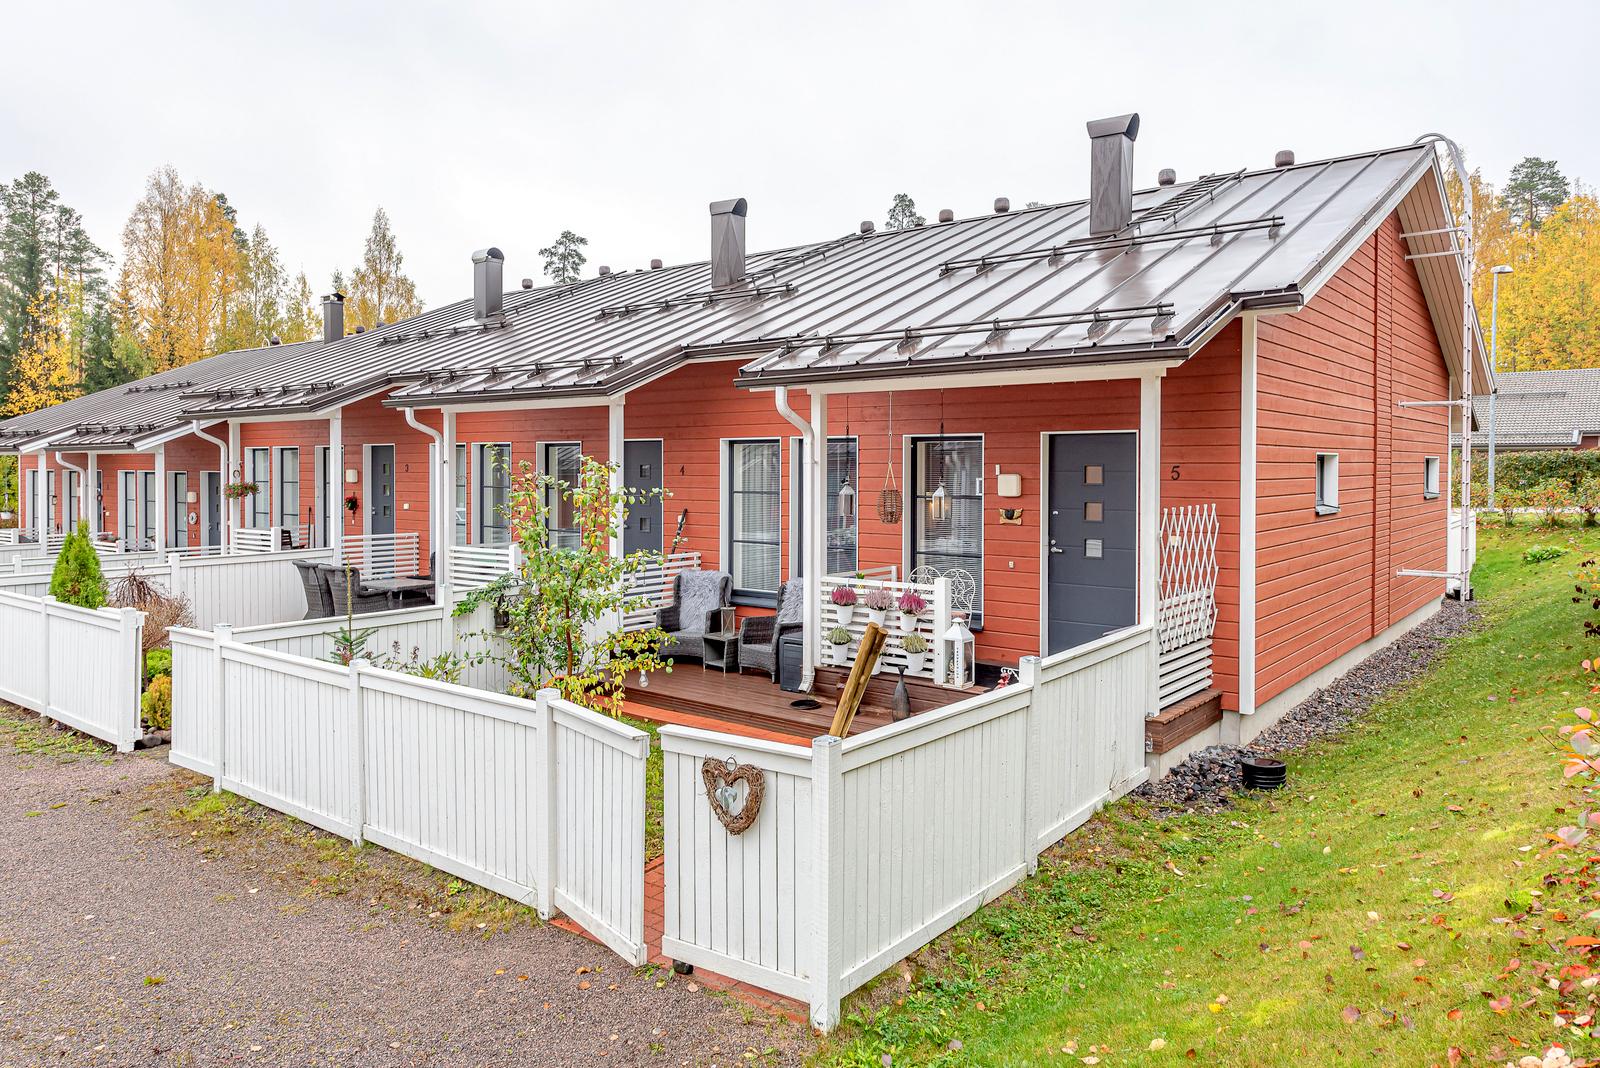 Jurvala, Mäntsälä